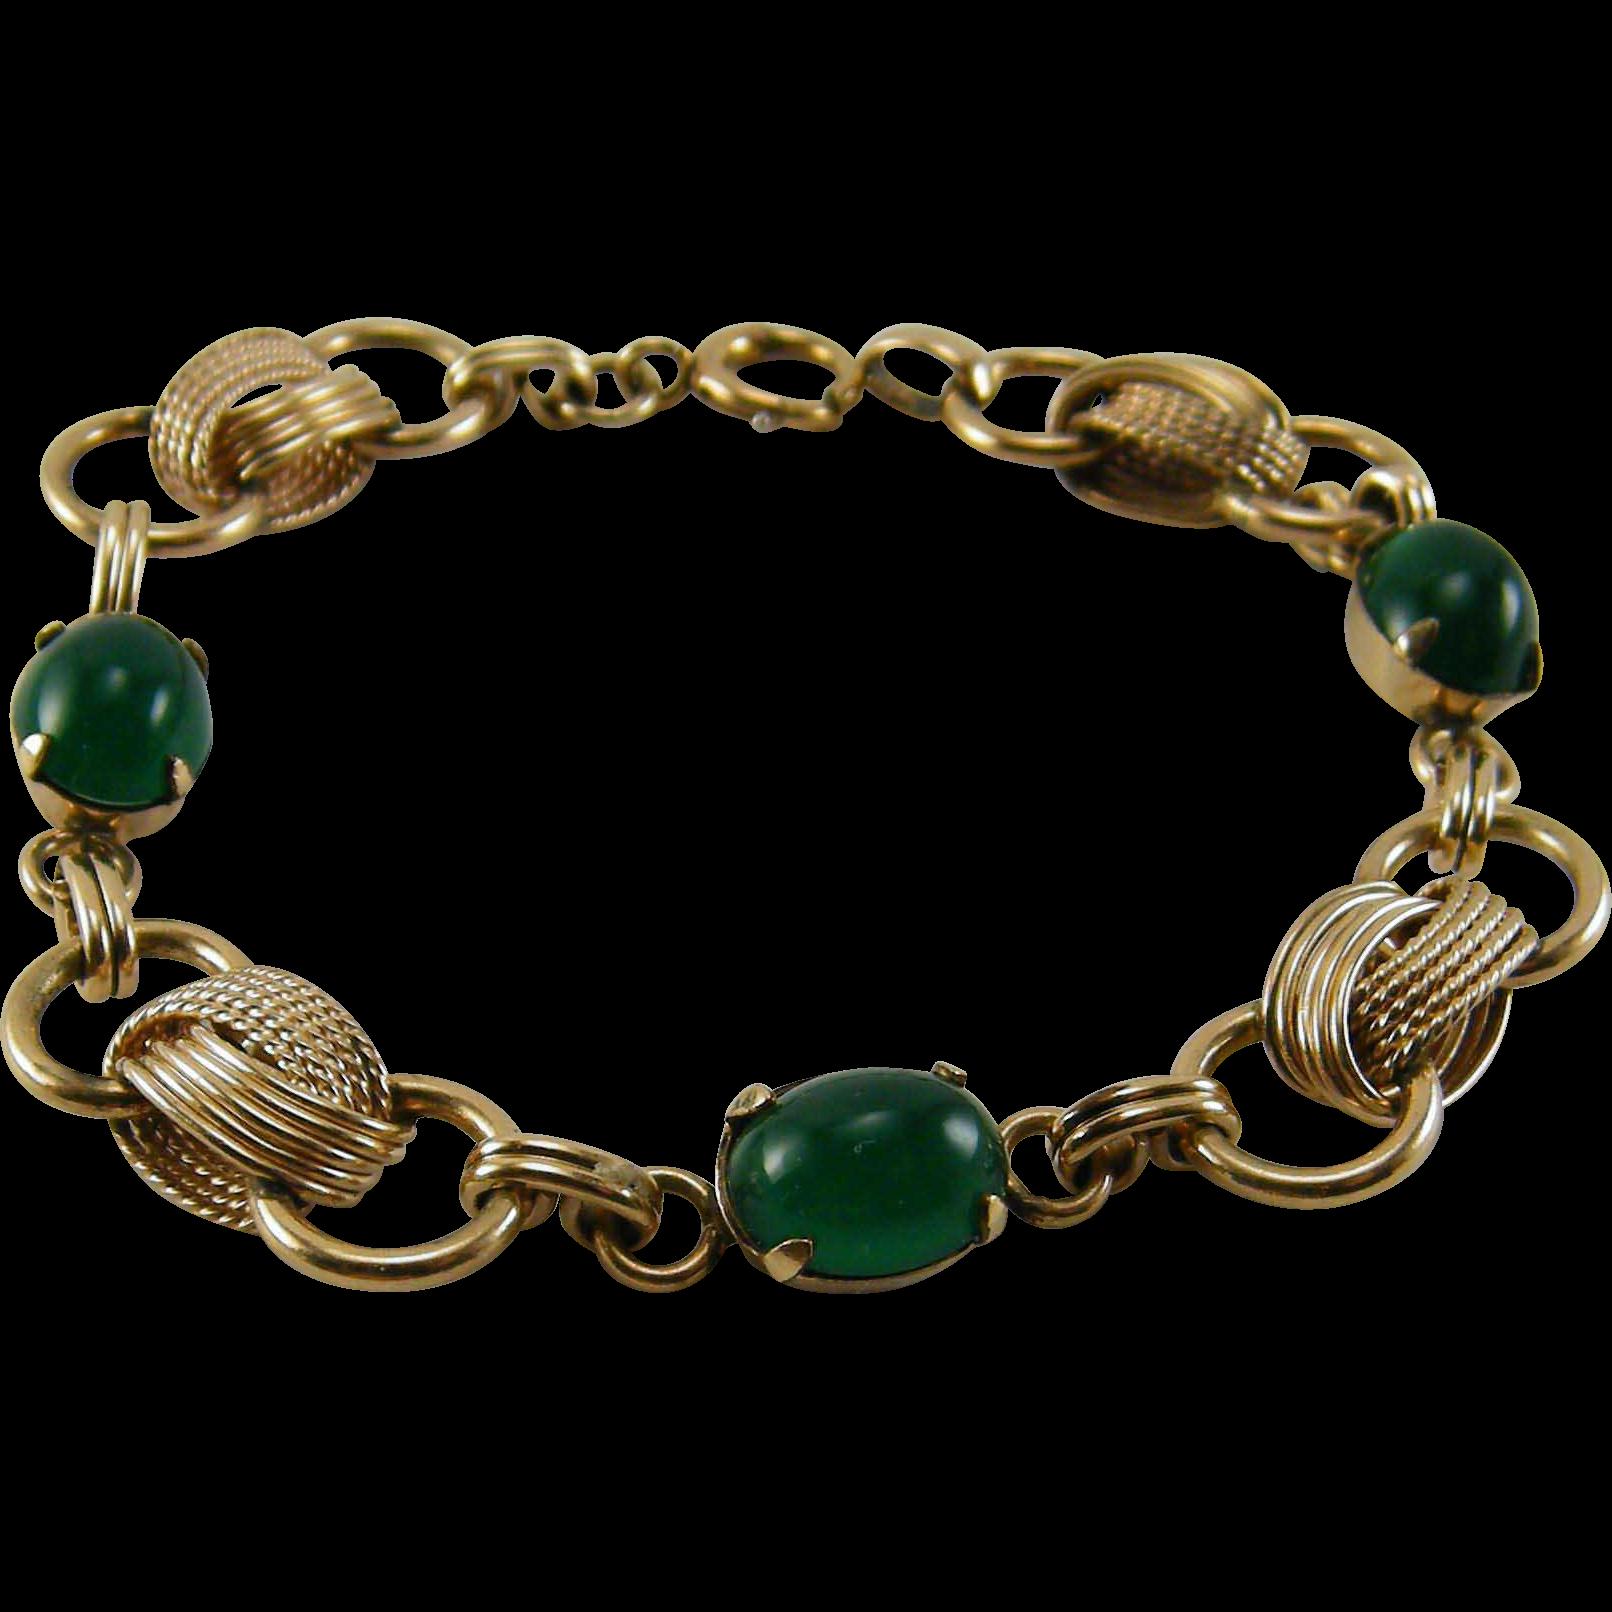 1930s Green Stone Bracelet 12K Gold Filled